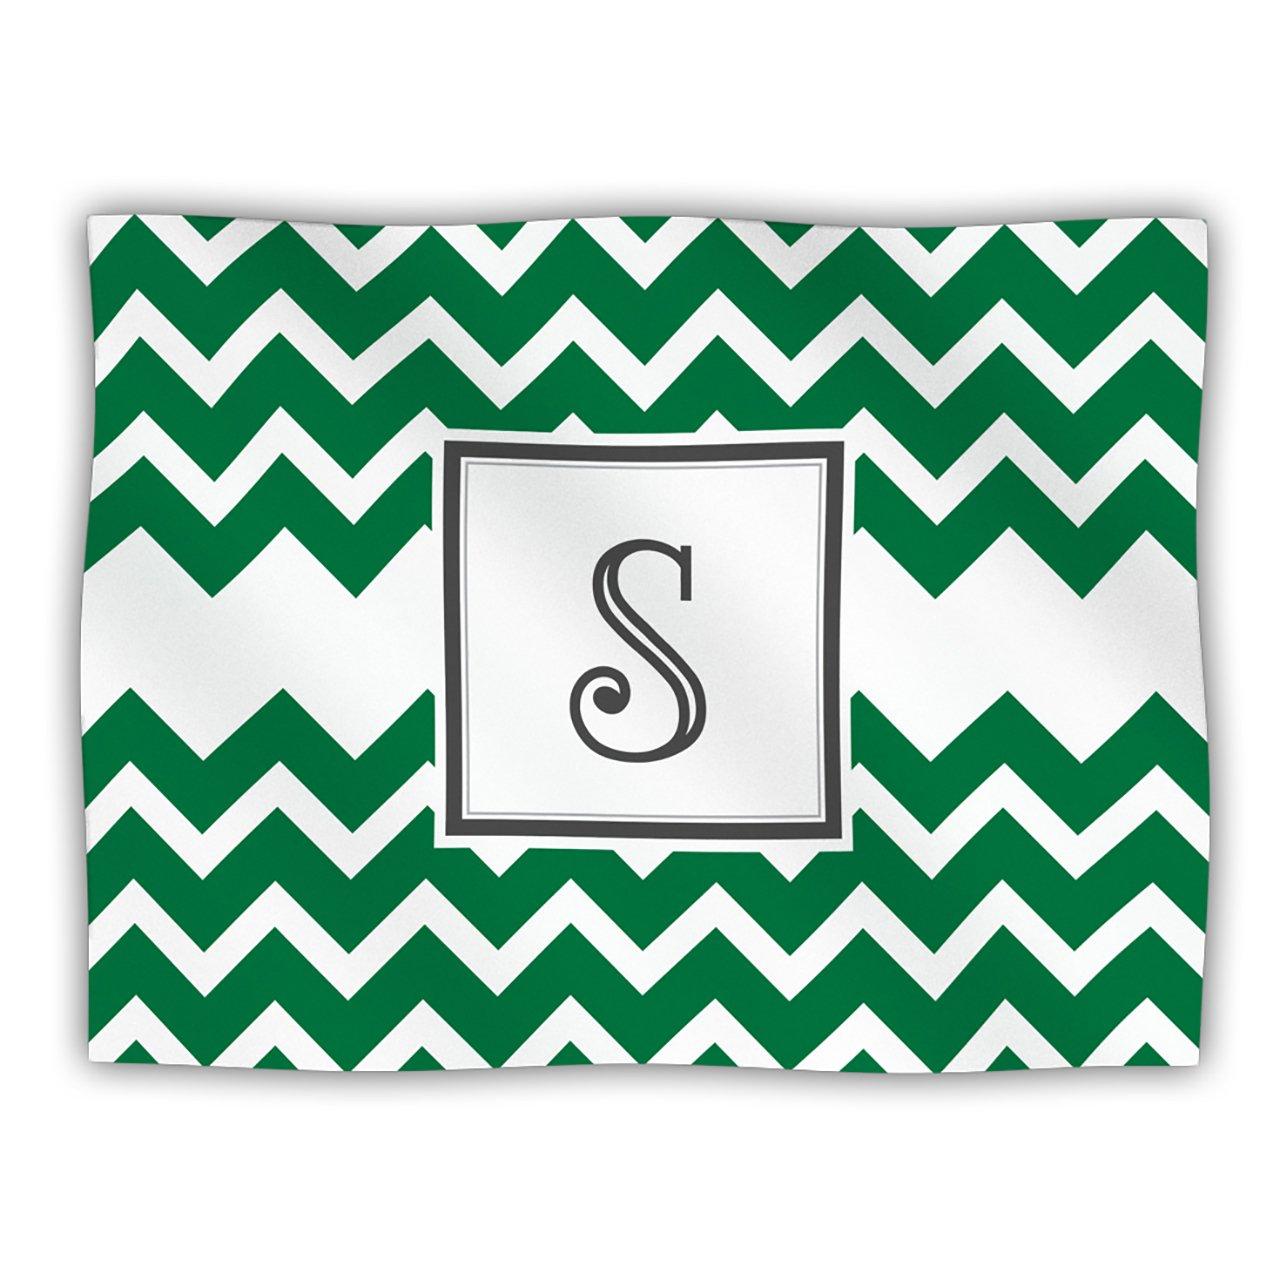 Kess InHouse KESS Original 'Monogram Chevron Green Letter S' Dog Blanket, 40 by 30-Inch